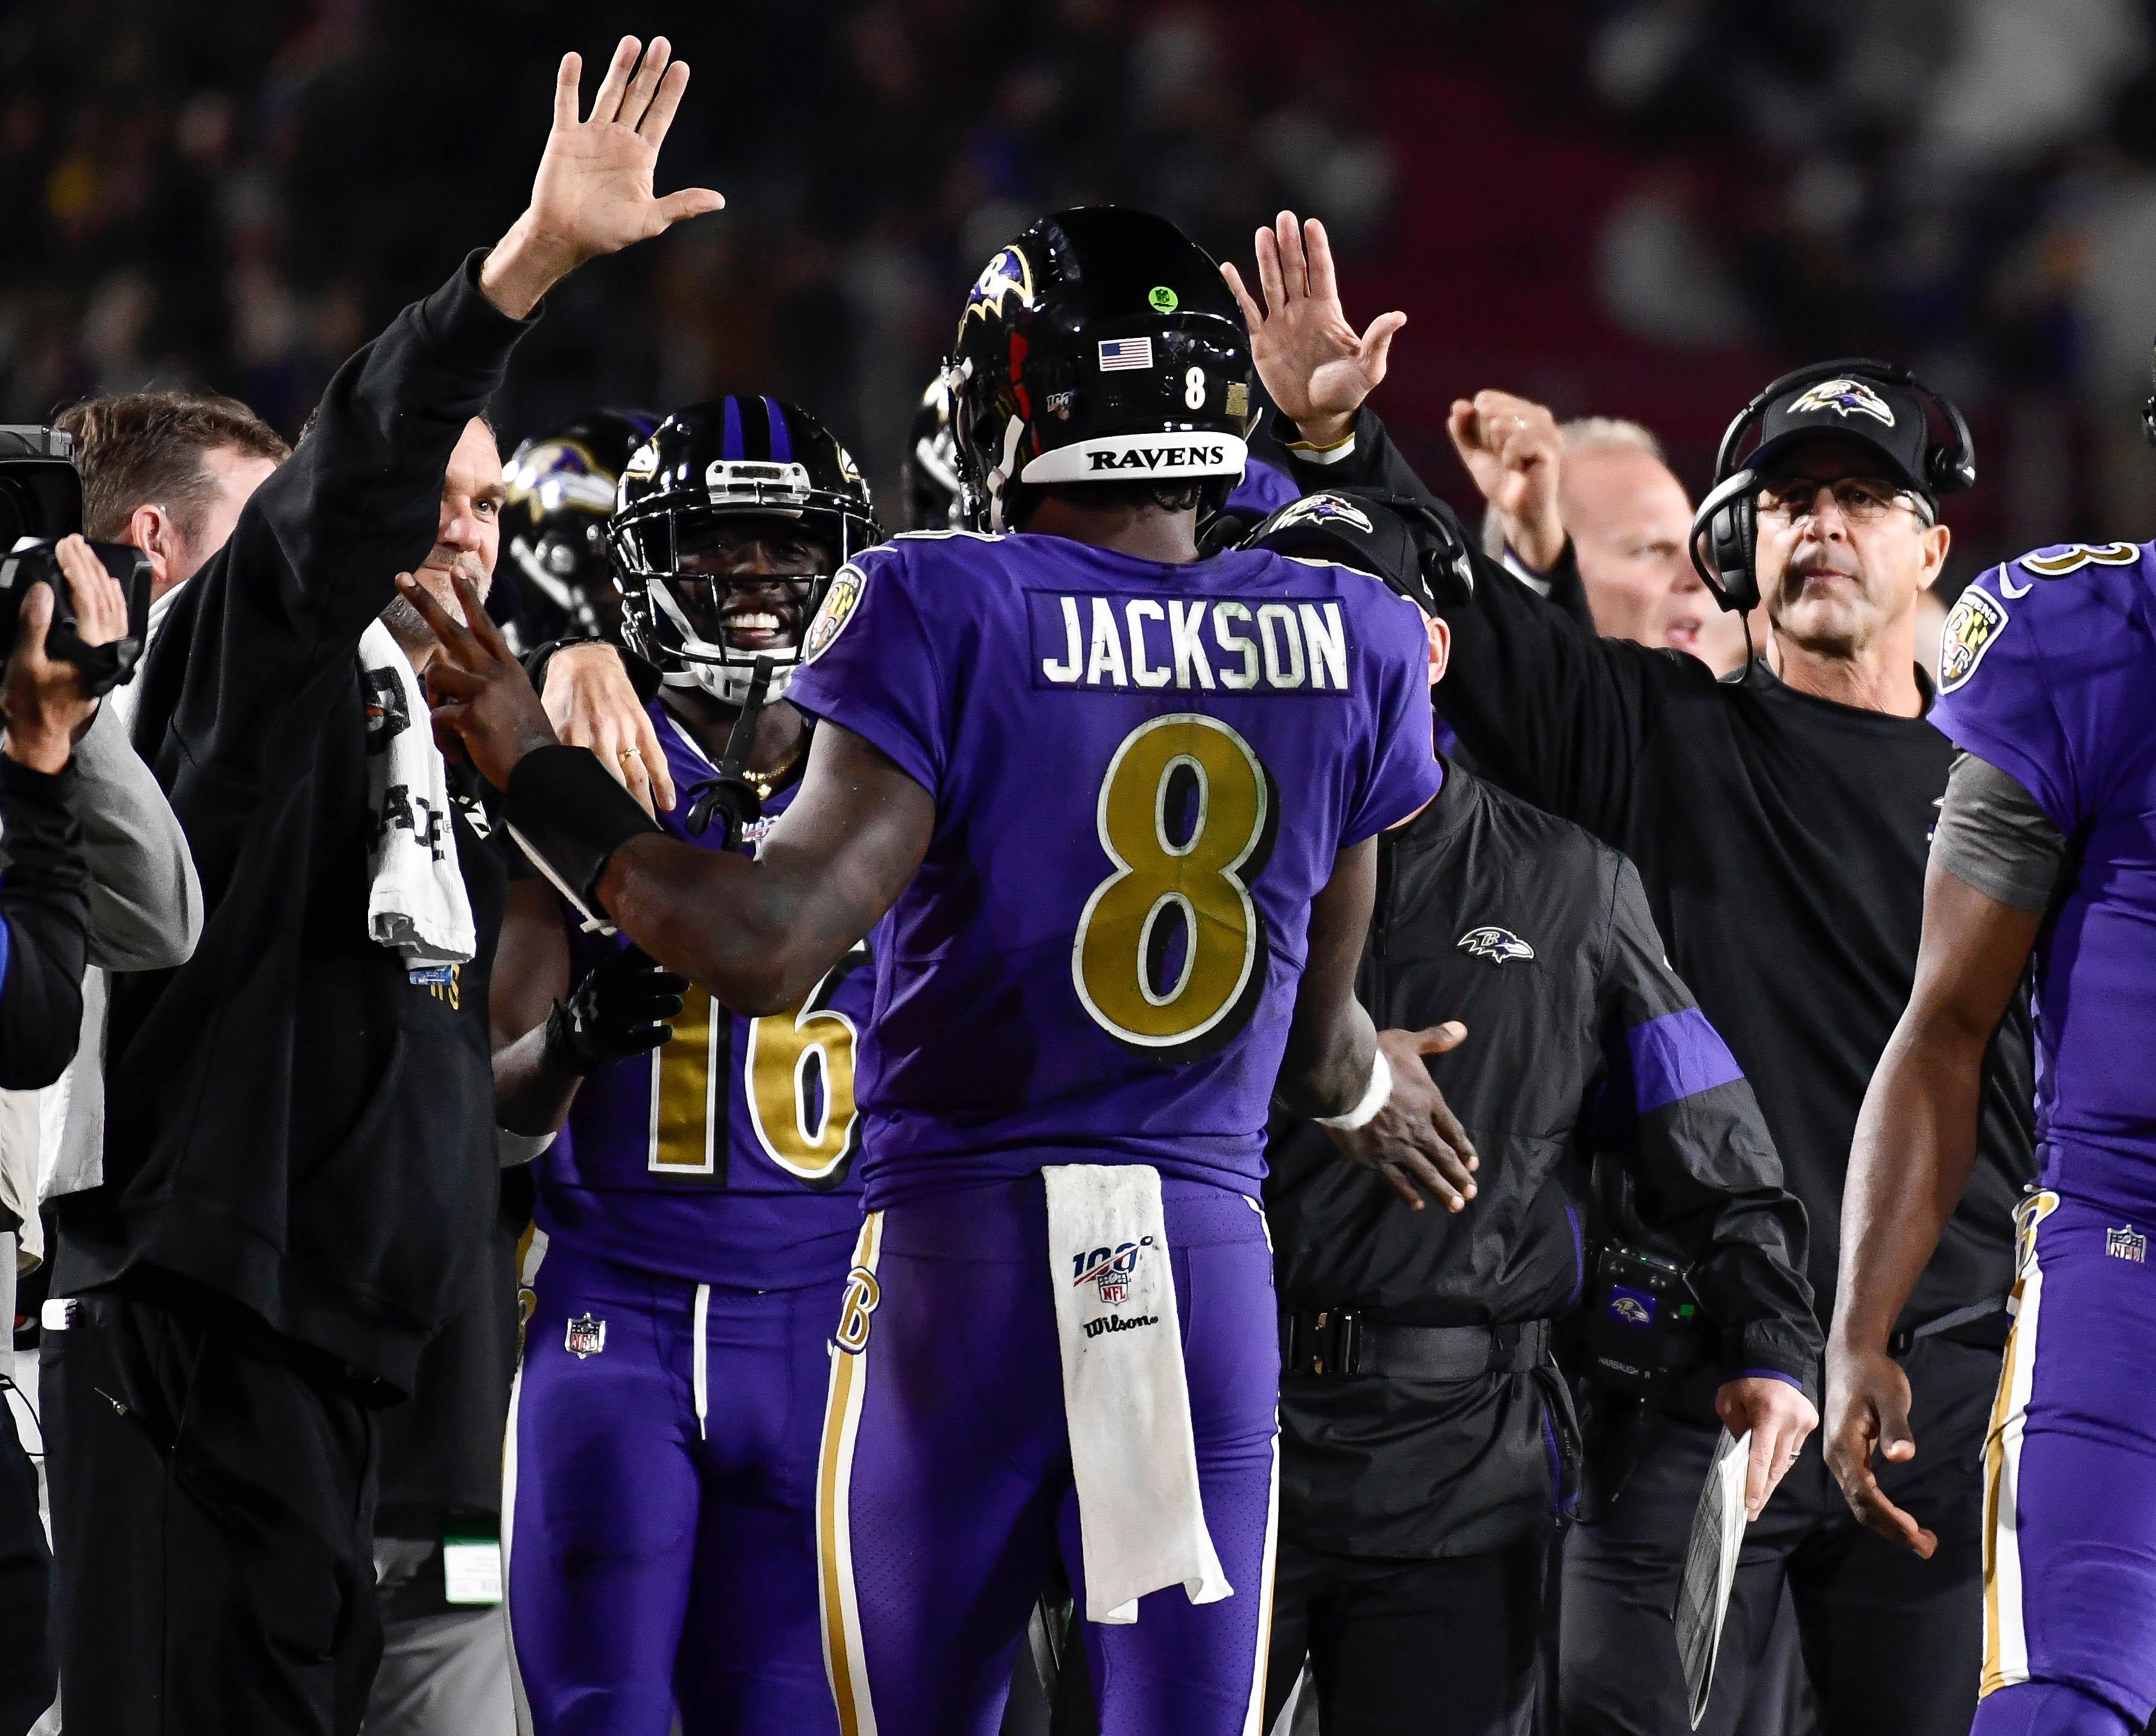 Lamar Jackson wins 2019 Otto Award